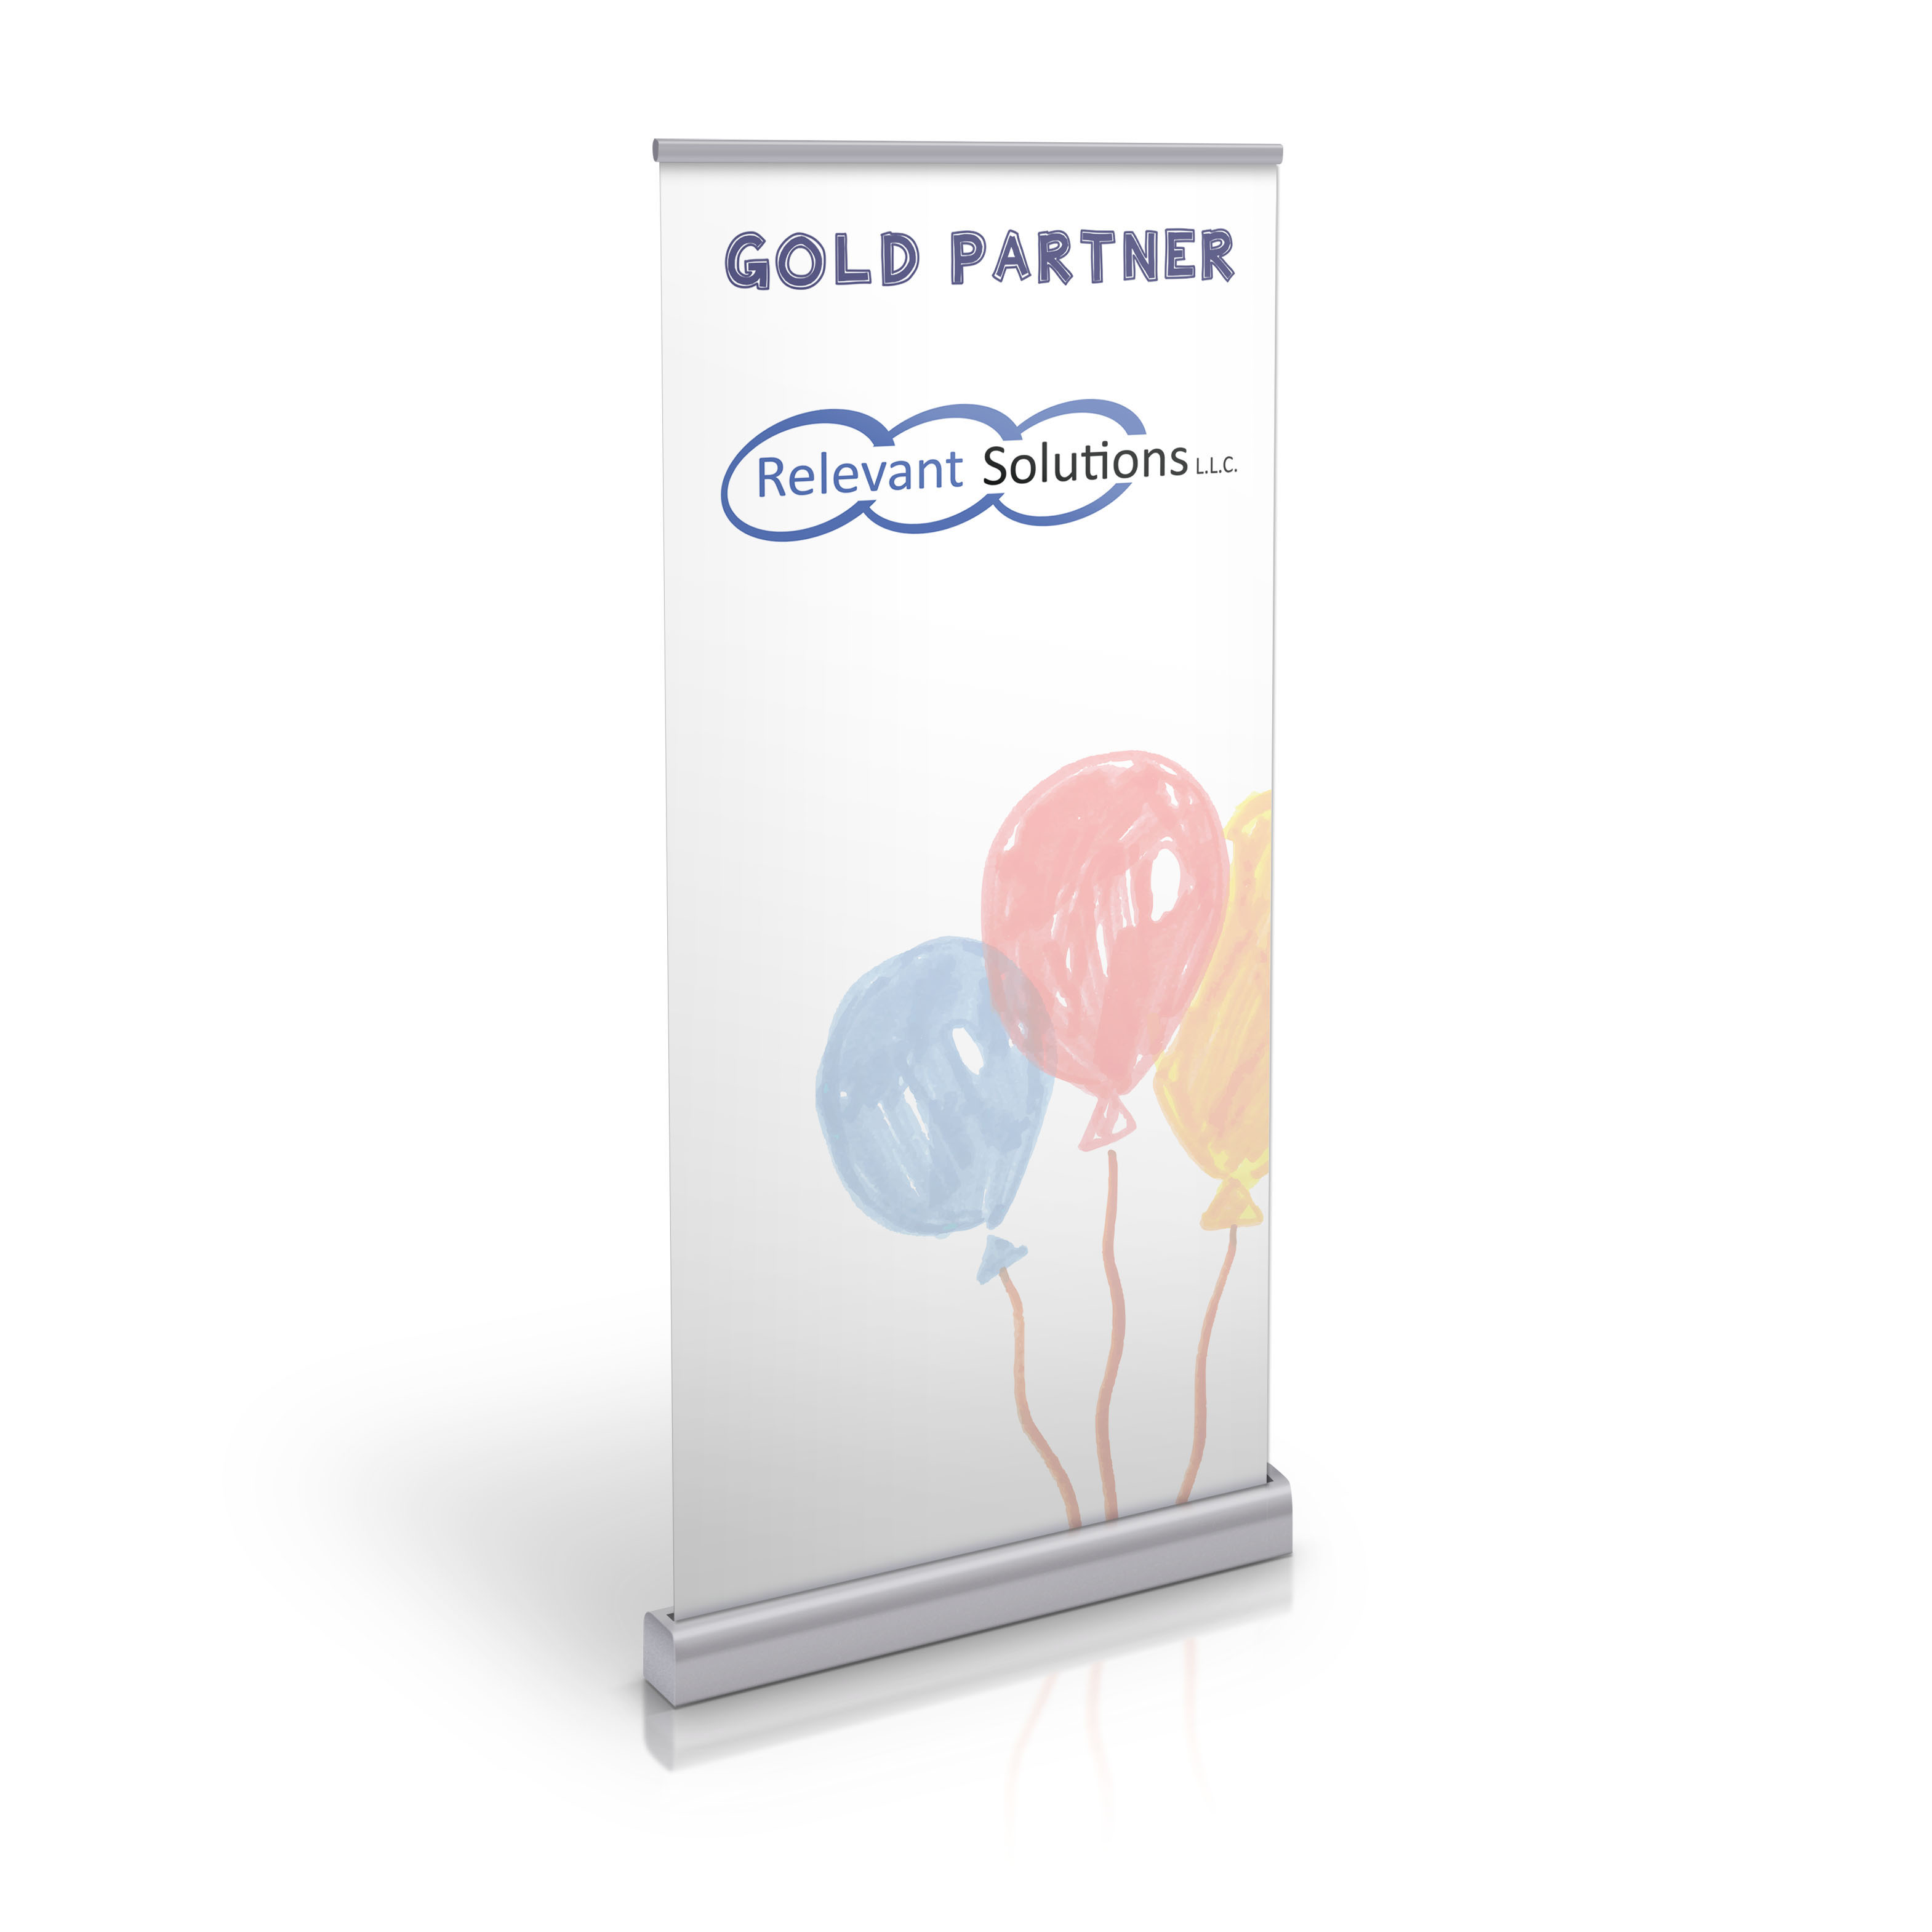 Gold-Partner-Quickscreen-MockUp_11-22